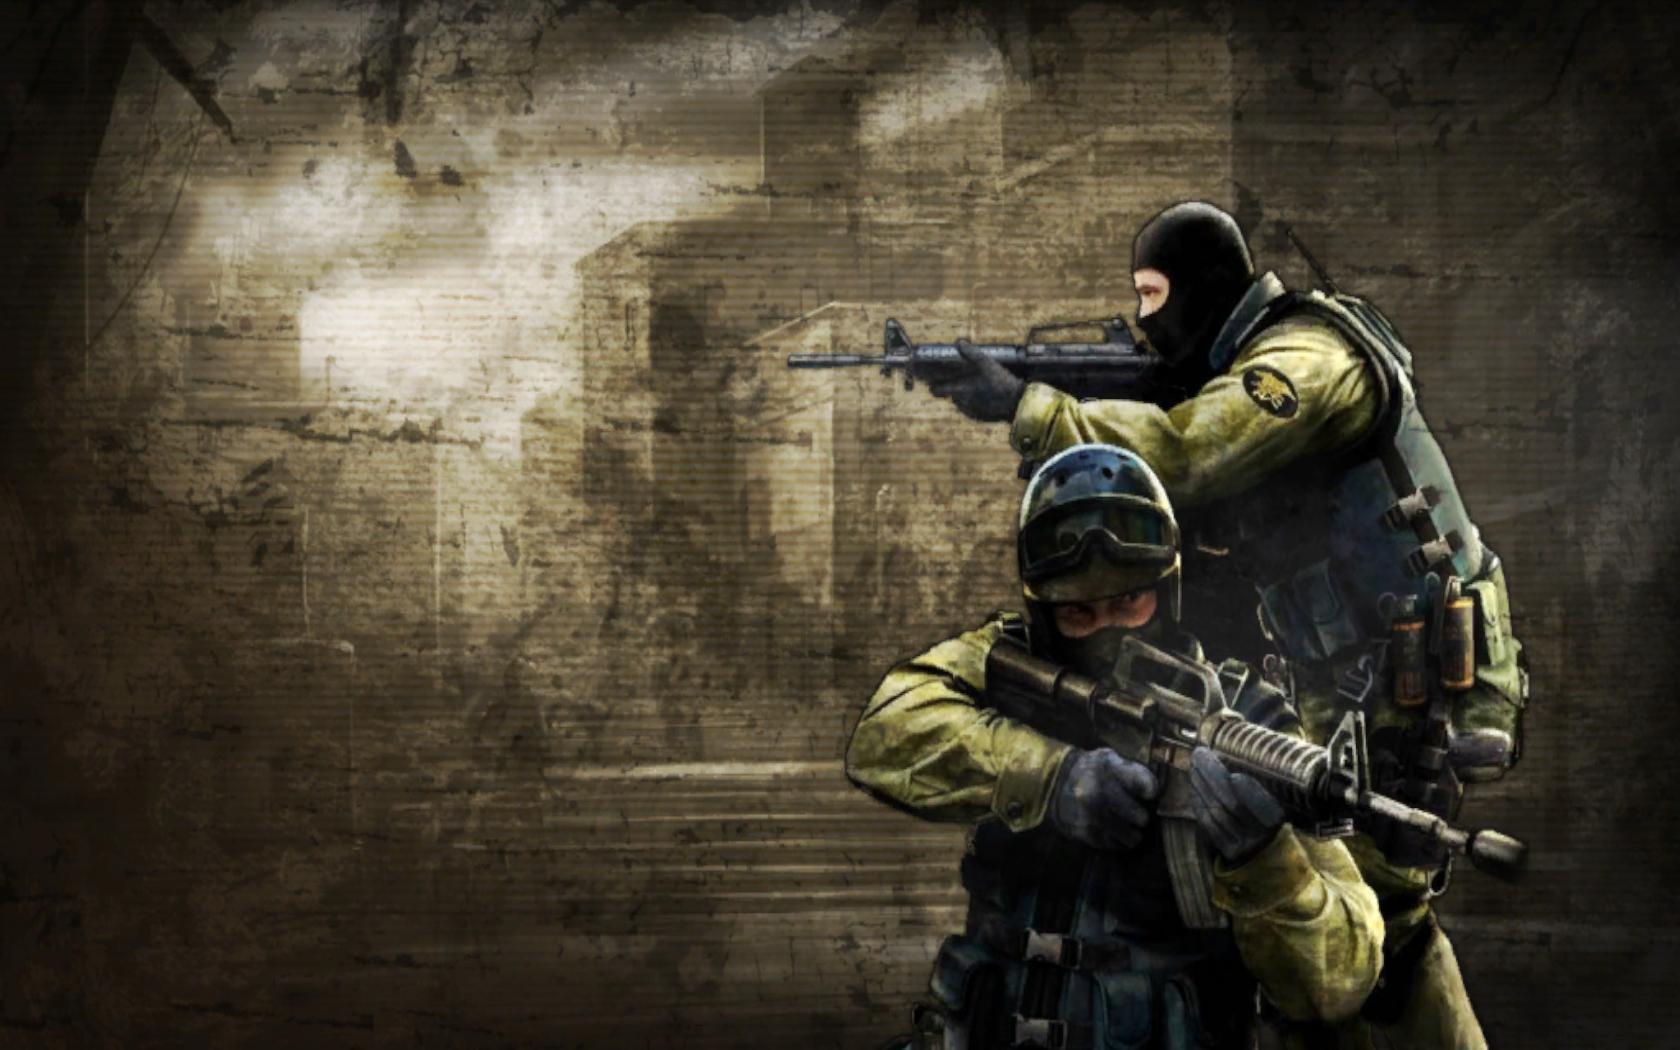 Counter Strike Source Wallpaper Wallpaper - Counter Strike Source , HD Wallpaper & Backgrounds